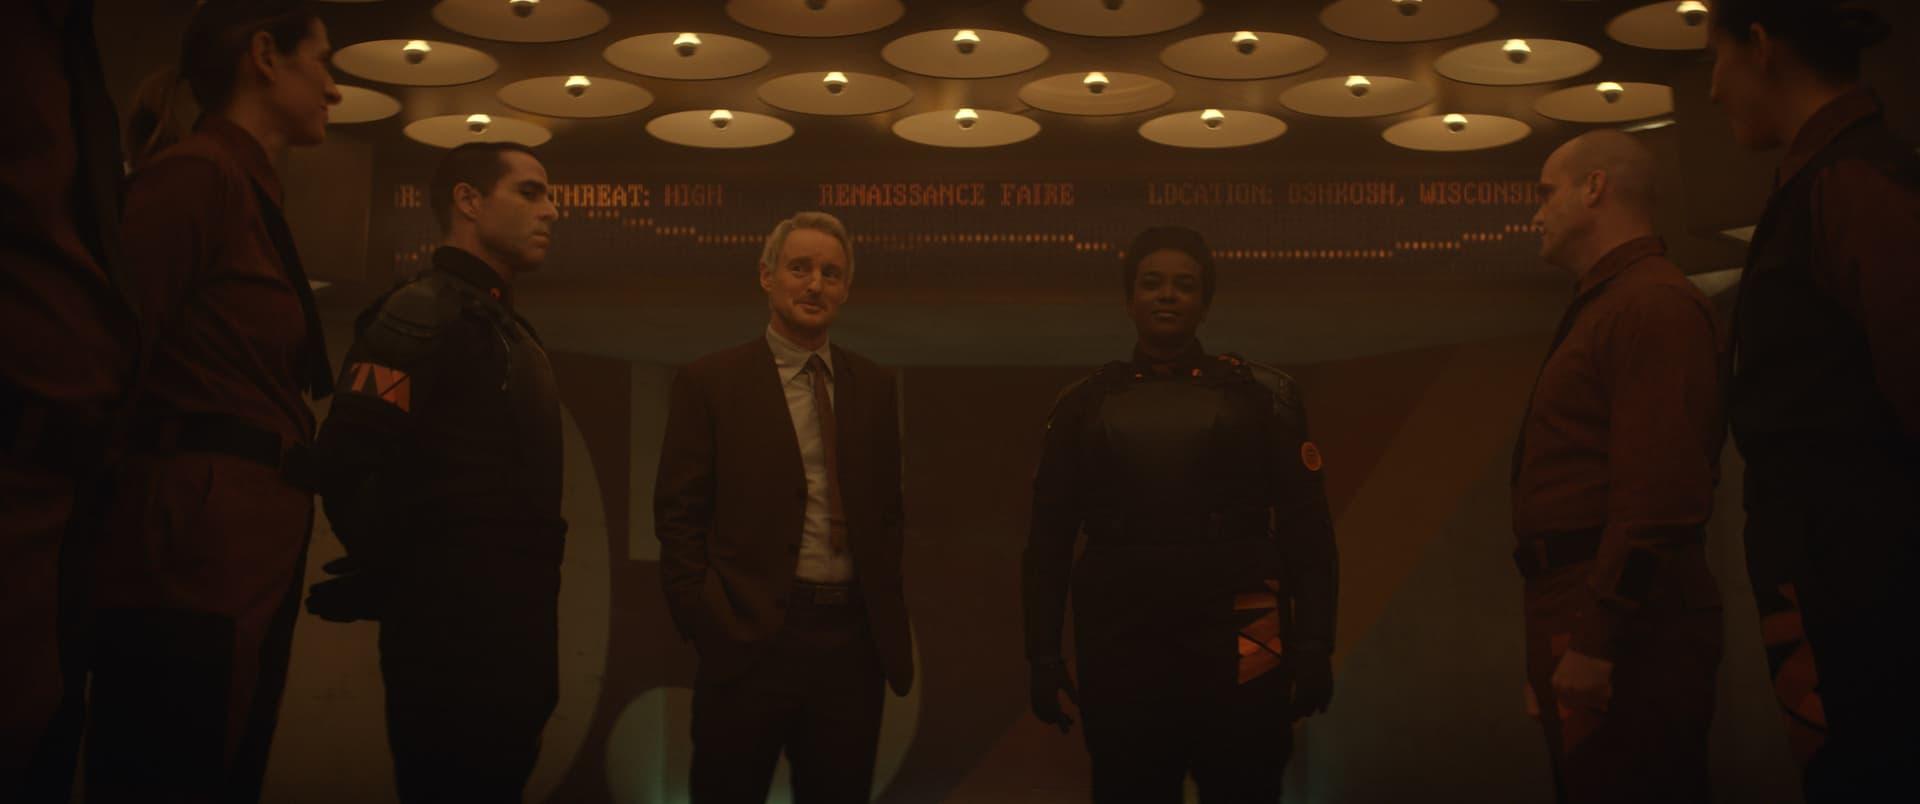 Loki: Episode 2 Event Report